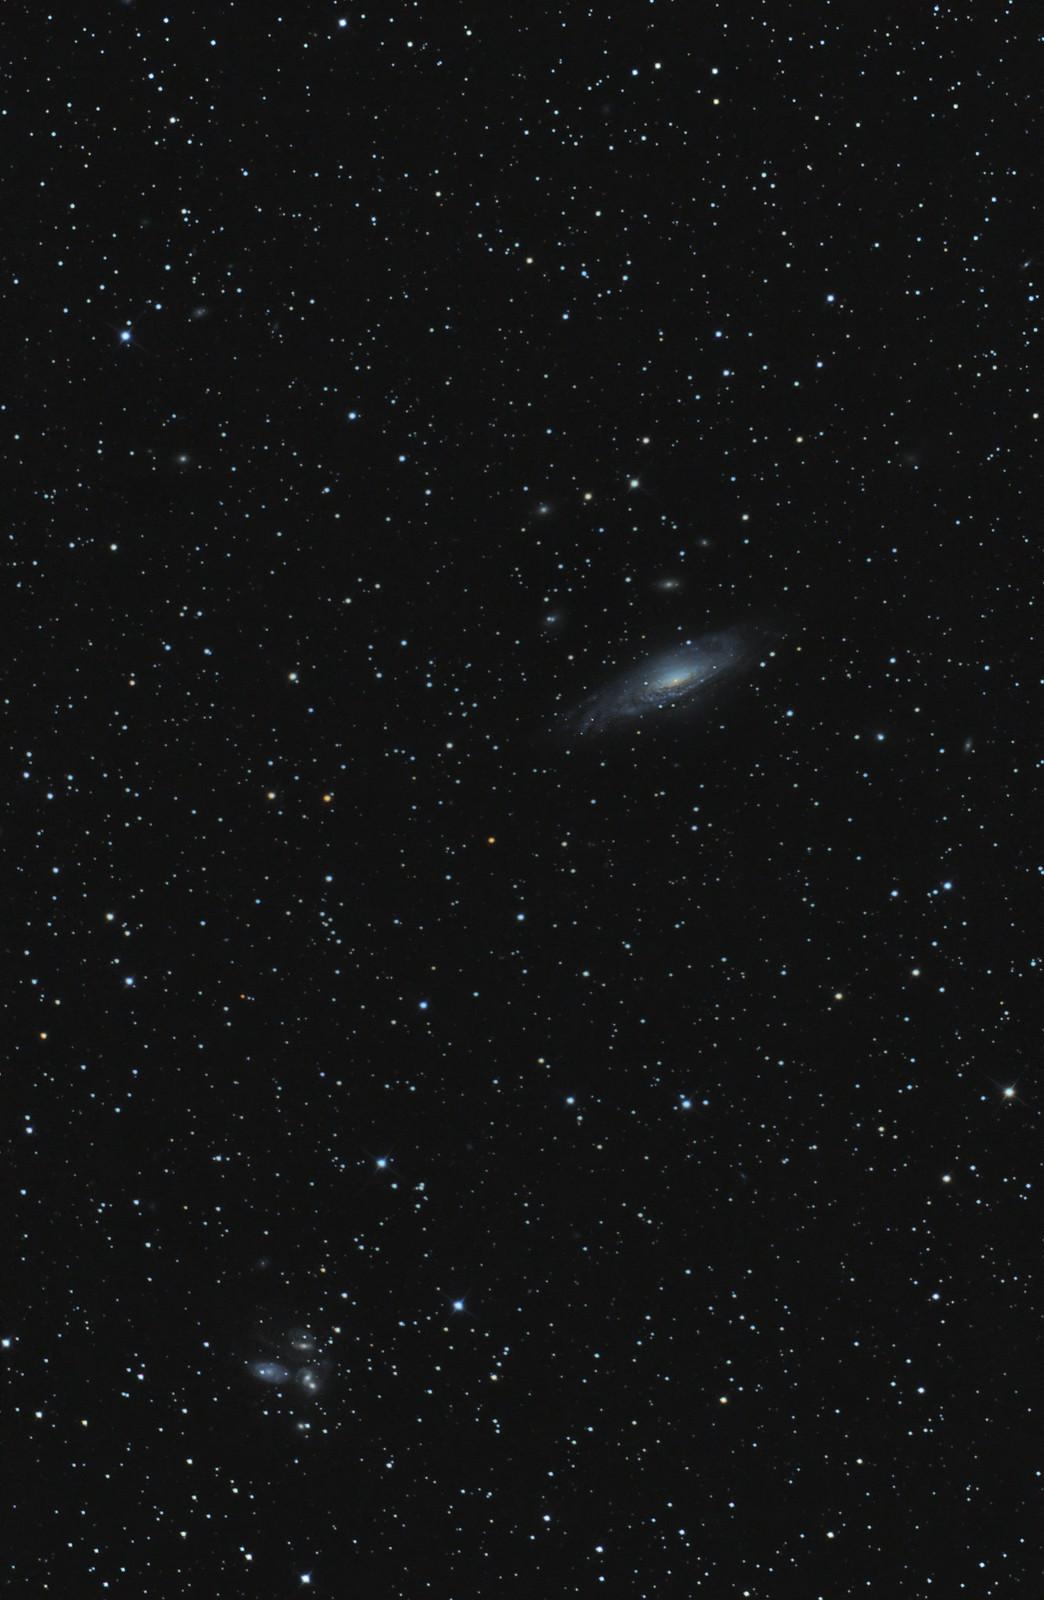 NGC 7331 : poses COURTES   28637364582_bf3b9ed487_h